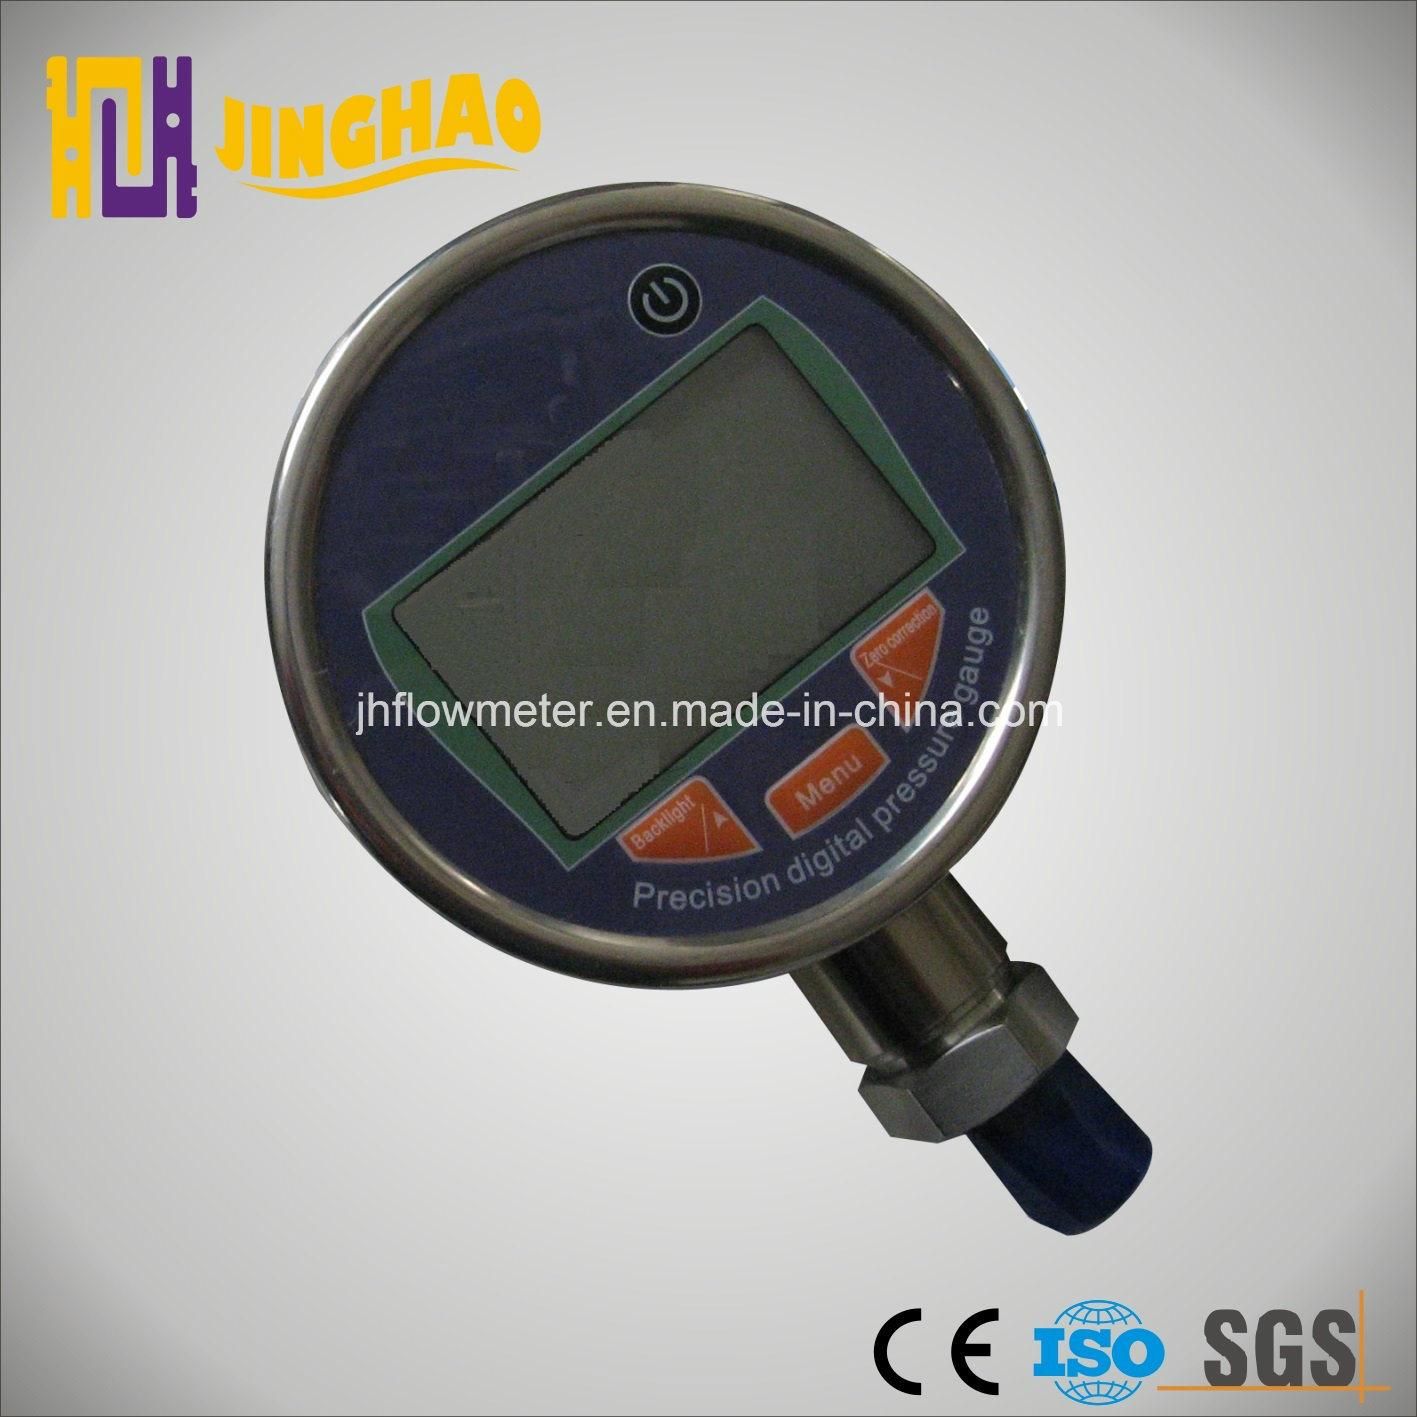 High Accuracy Digital Compression Pressure Gauge (JH-YL-RG)